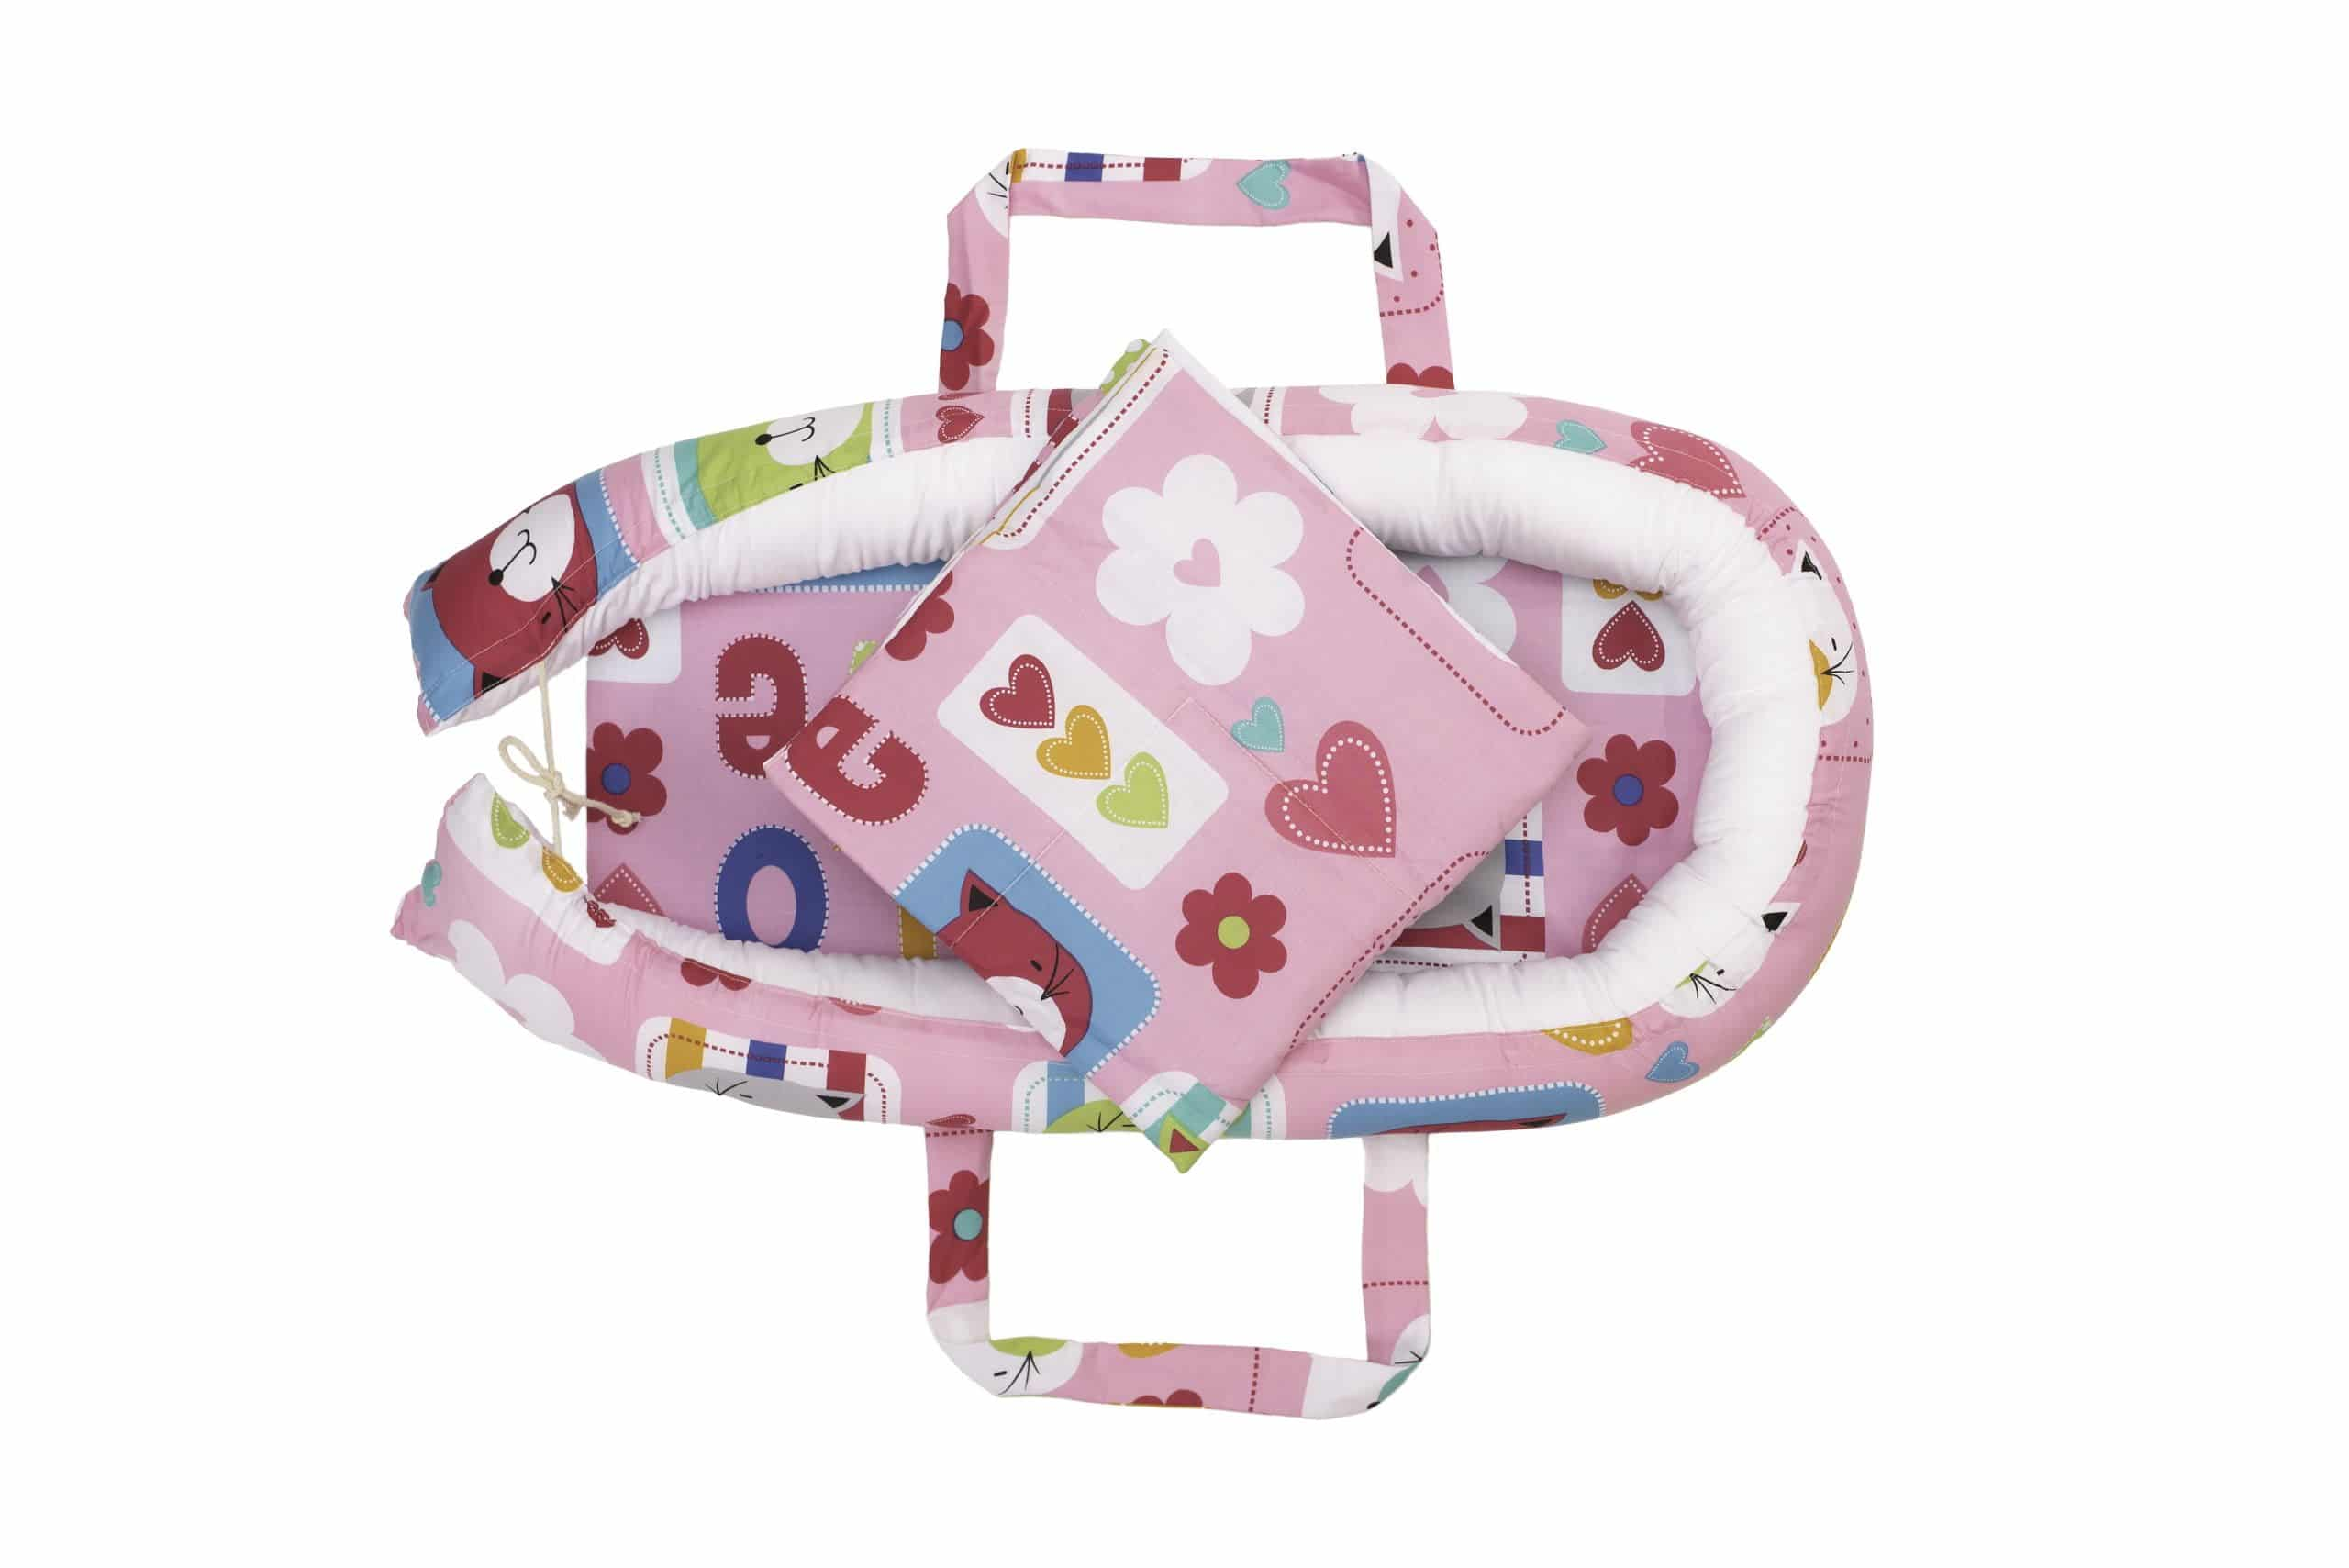 Baby Nest Somnart: Cosulet bebelusi + Salteluta 42x84x2 cm + Paturica 70x70 cm model Pisicute imagine 2021 somnart.ro